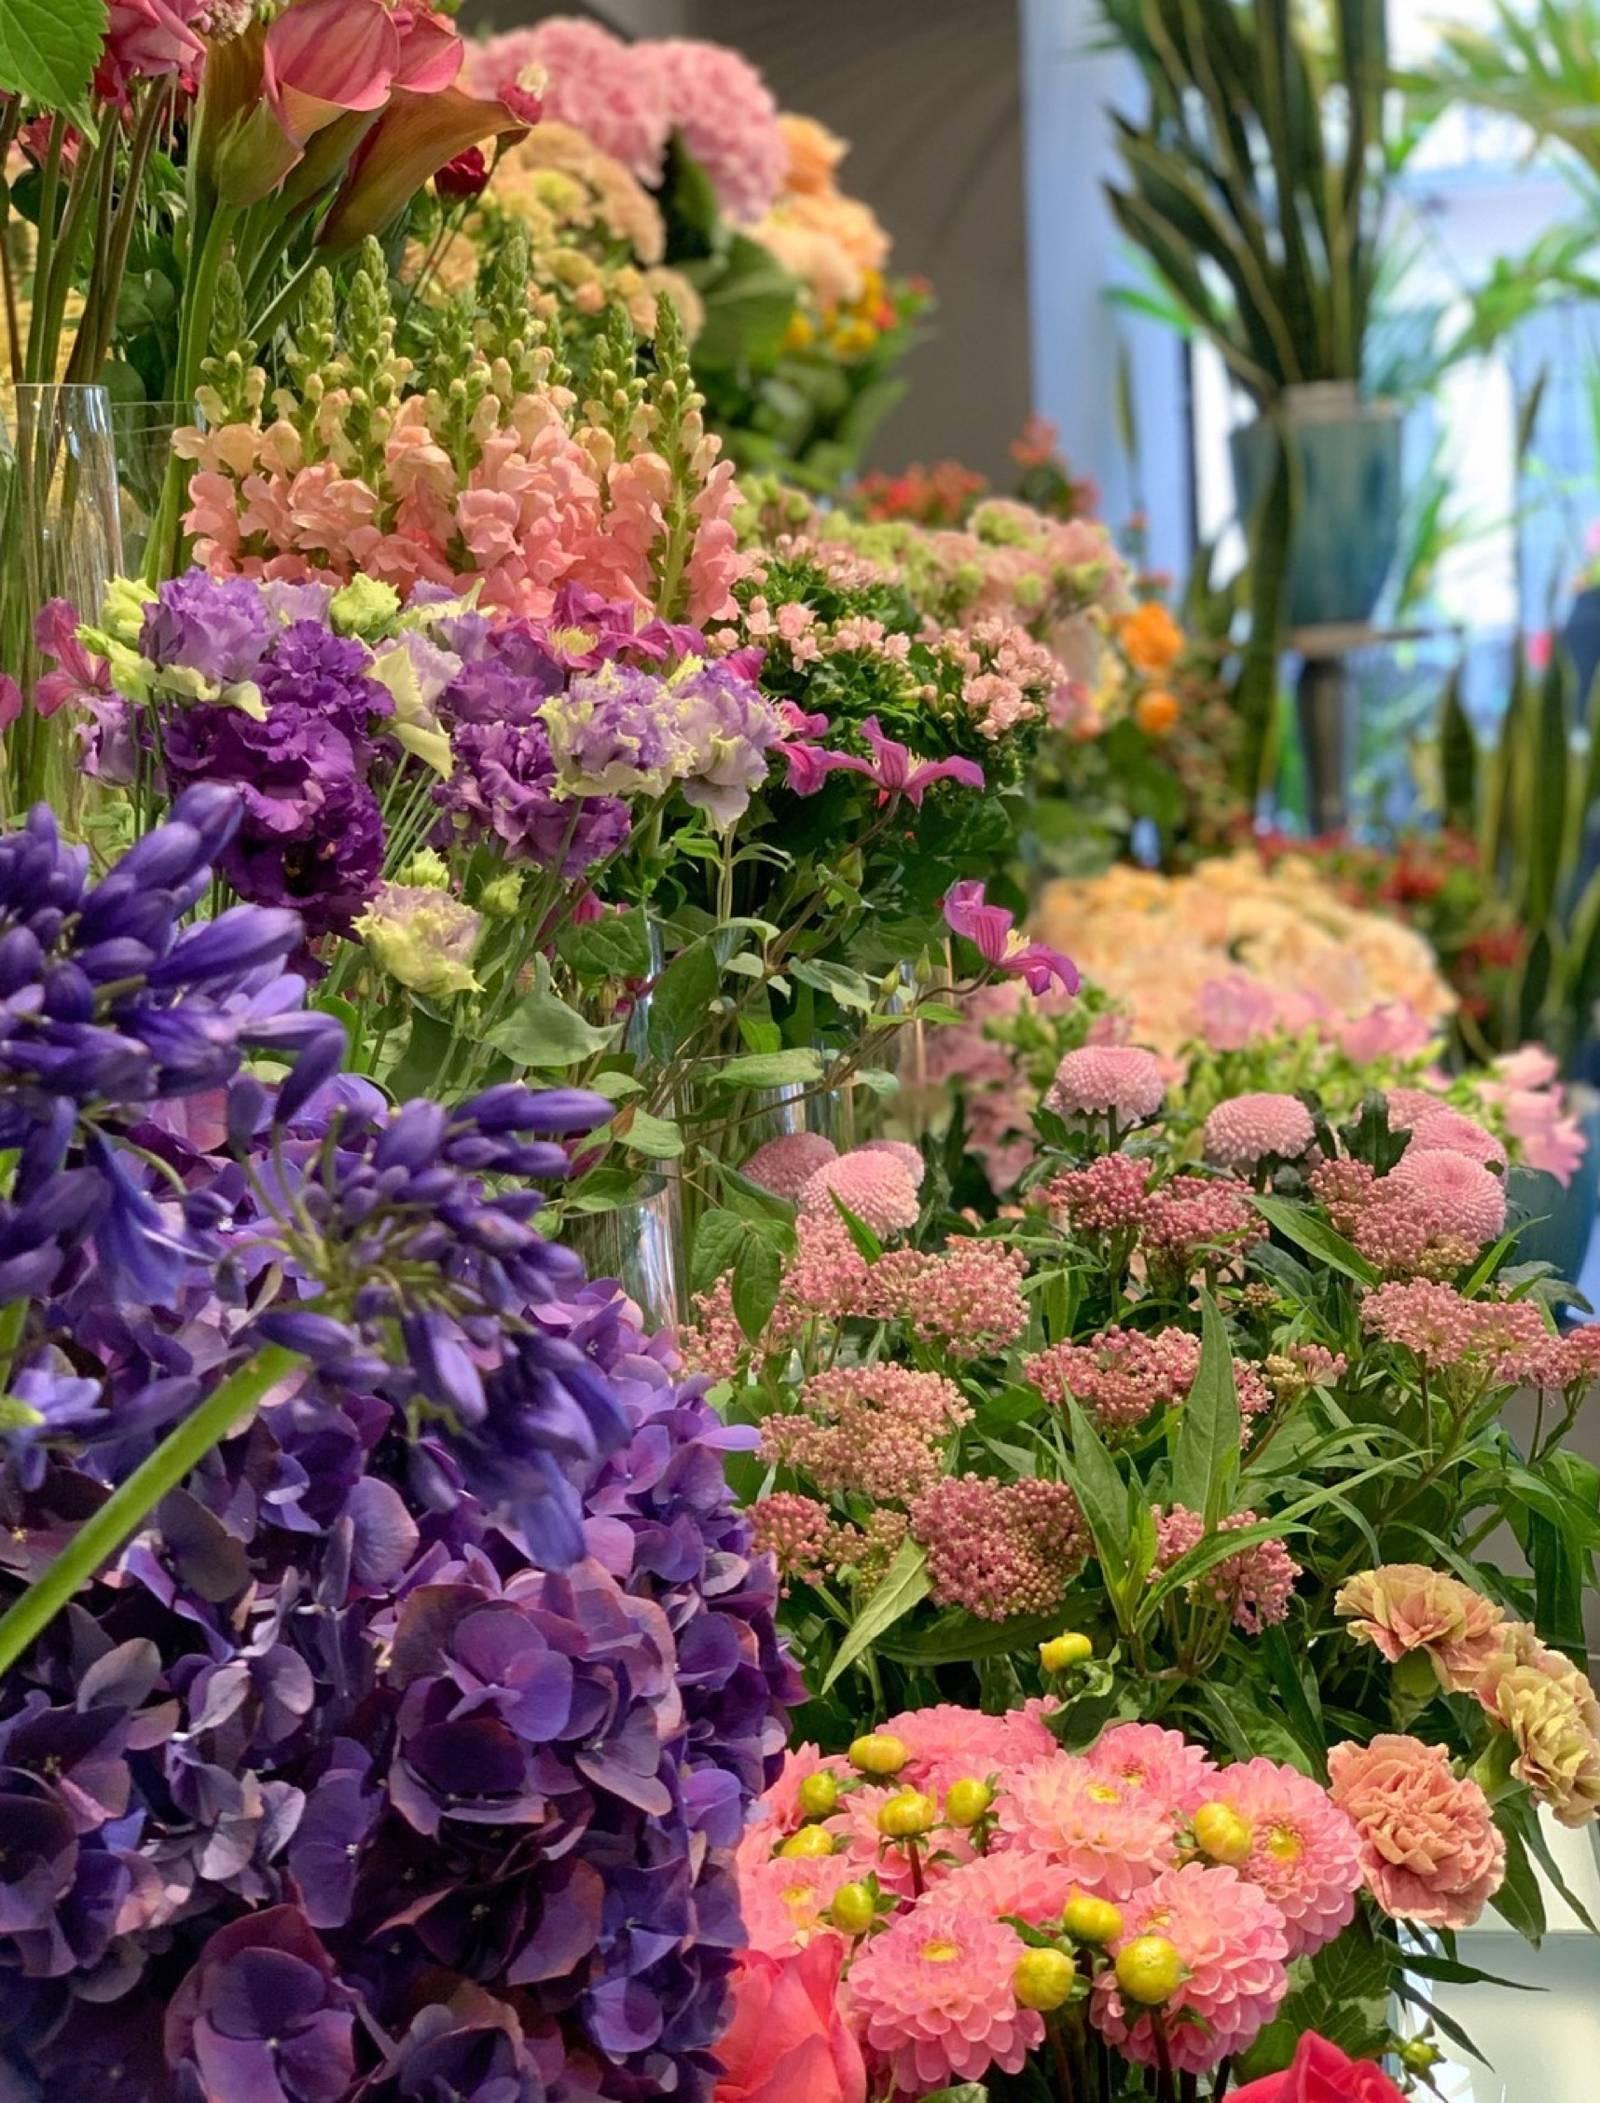 Flowers at the Belgravia Boutique flower shop.